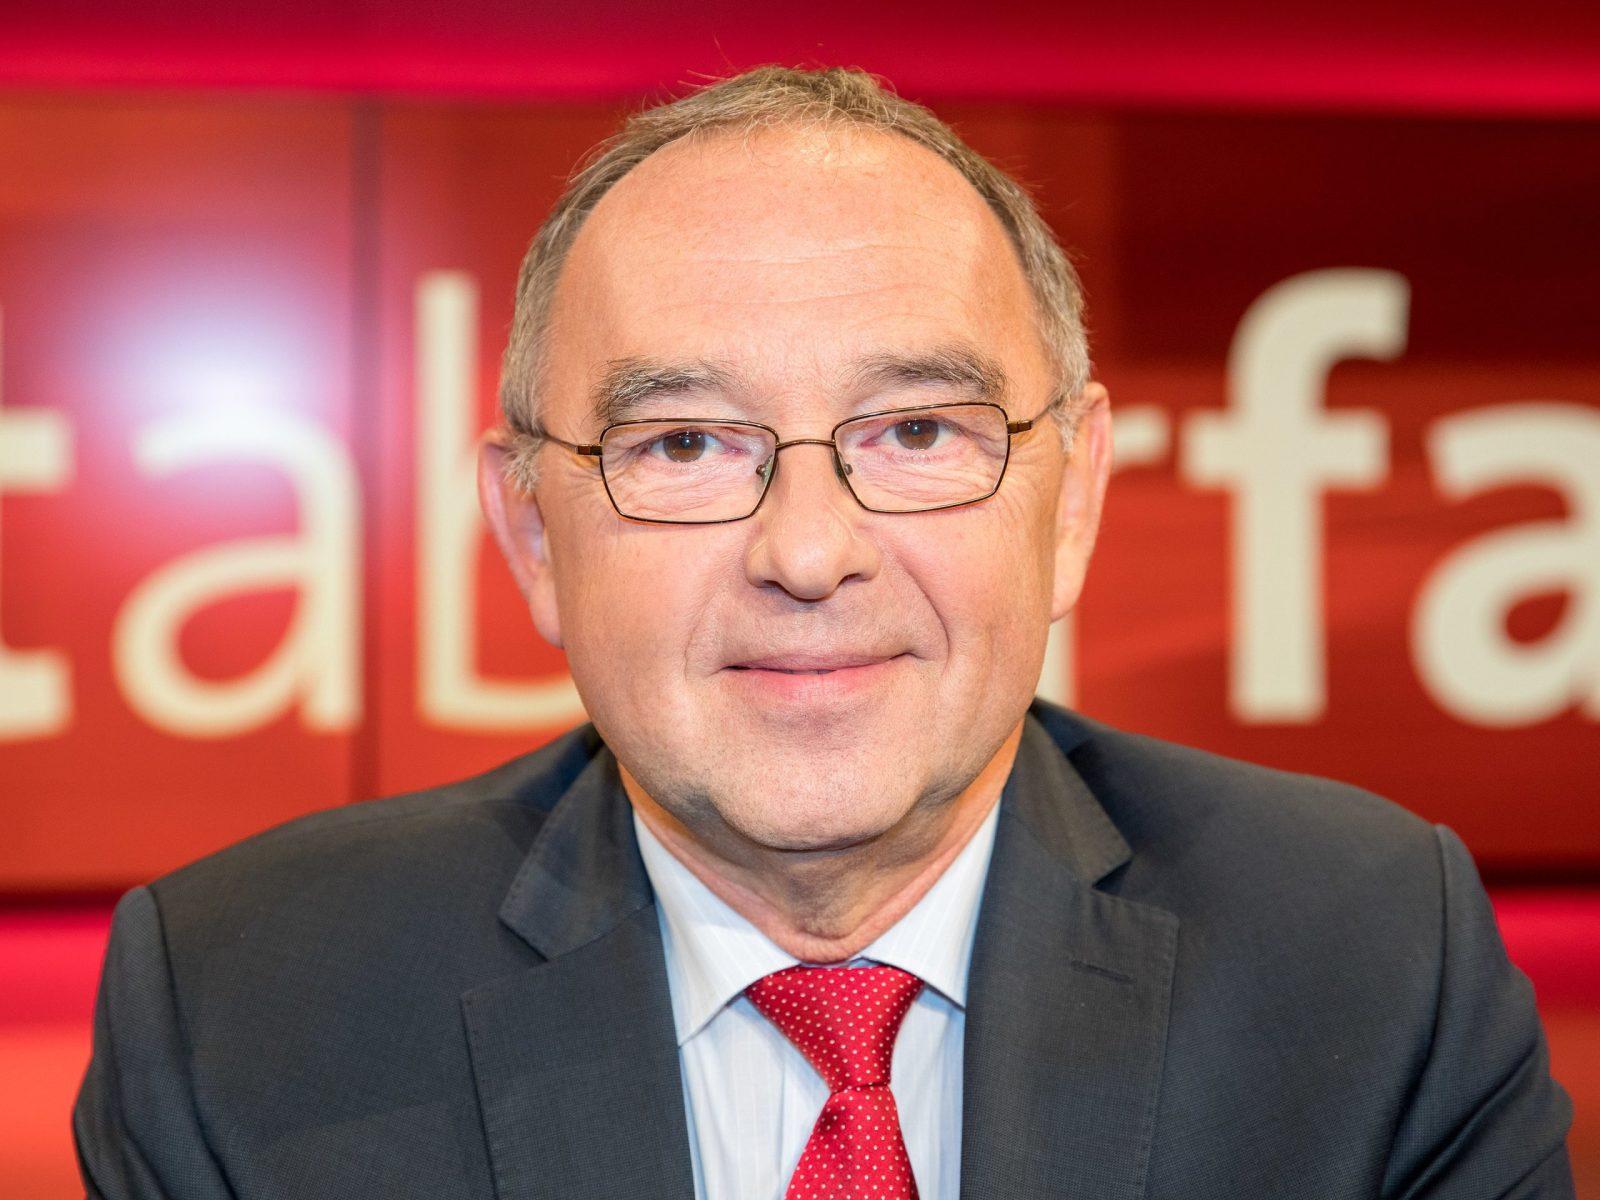 Norbert Walter-Borjans ist neuer SPD-Chef